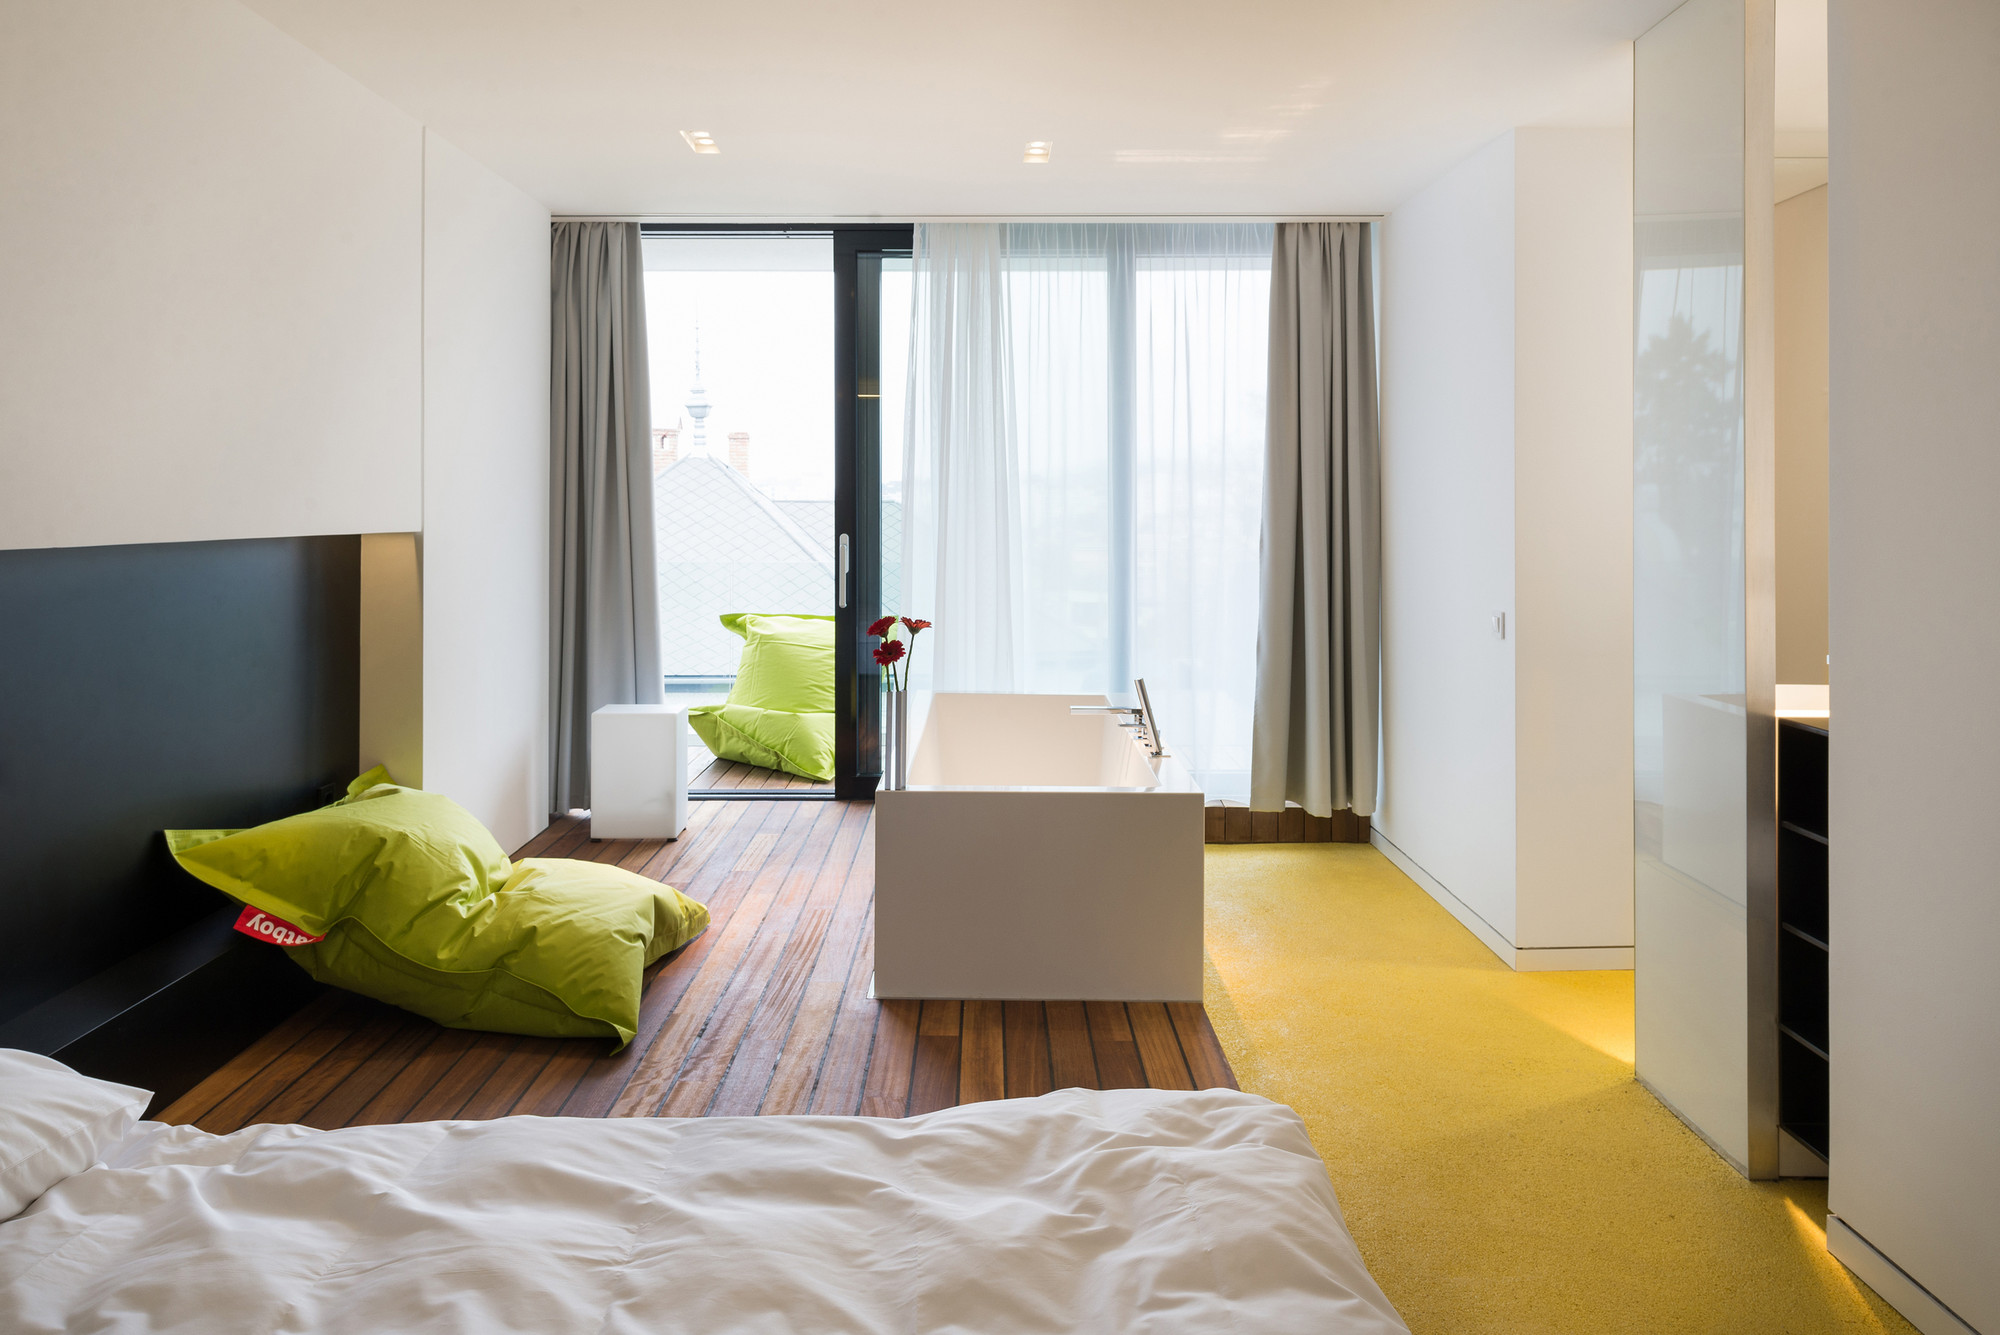 Hotel Privo De3 Group - 23